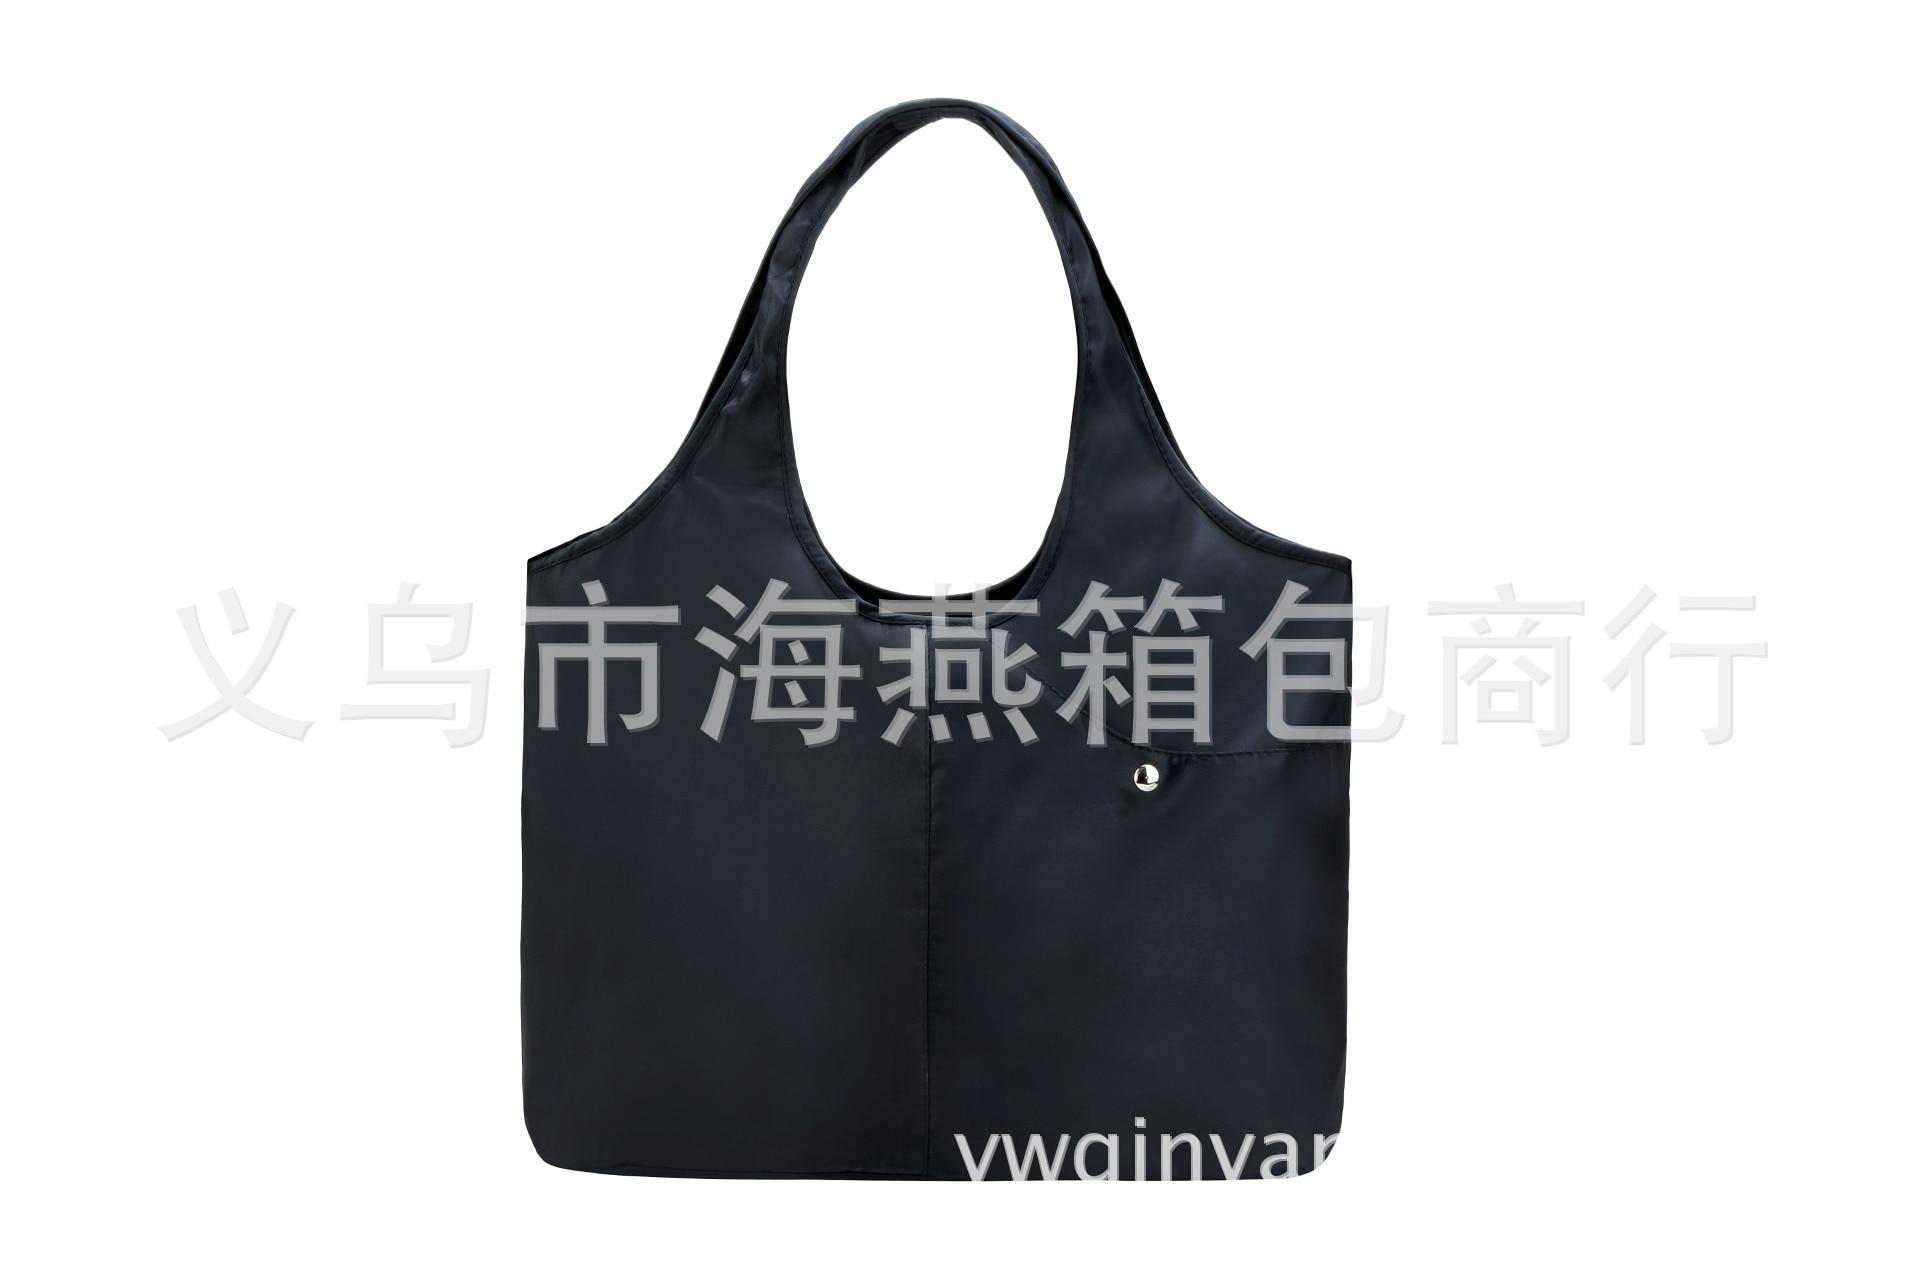 Large-Volume Multi-functional Mummy Bag WOMEN'S Shoulder Bag WOMEN'S Bag Handbag Storgage Bag WOMEN'S Bag Bag Baby